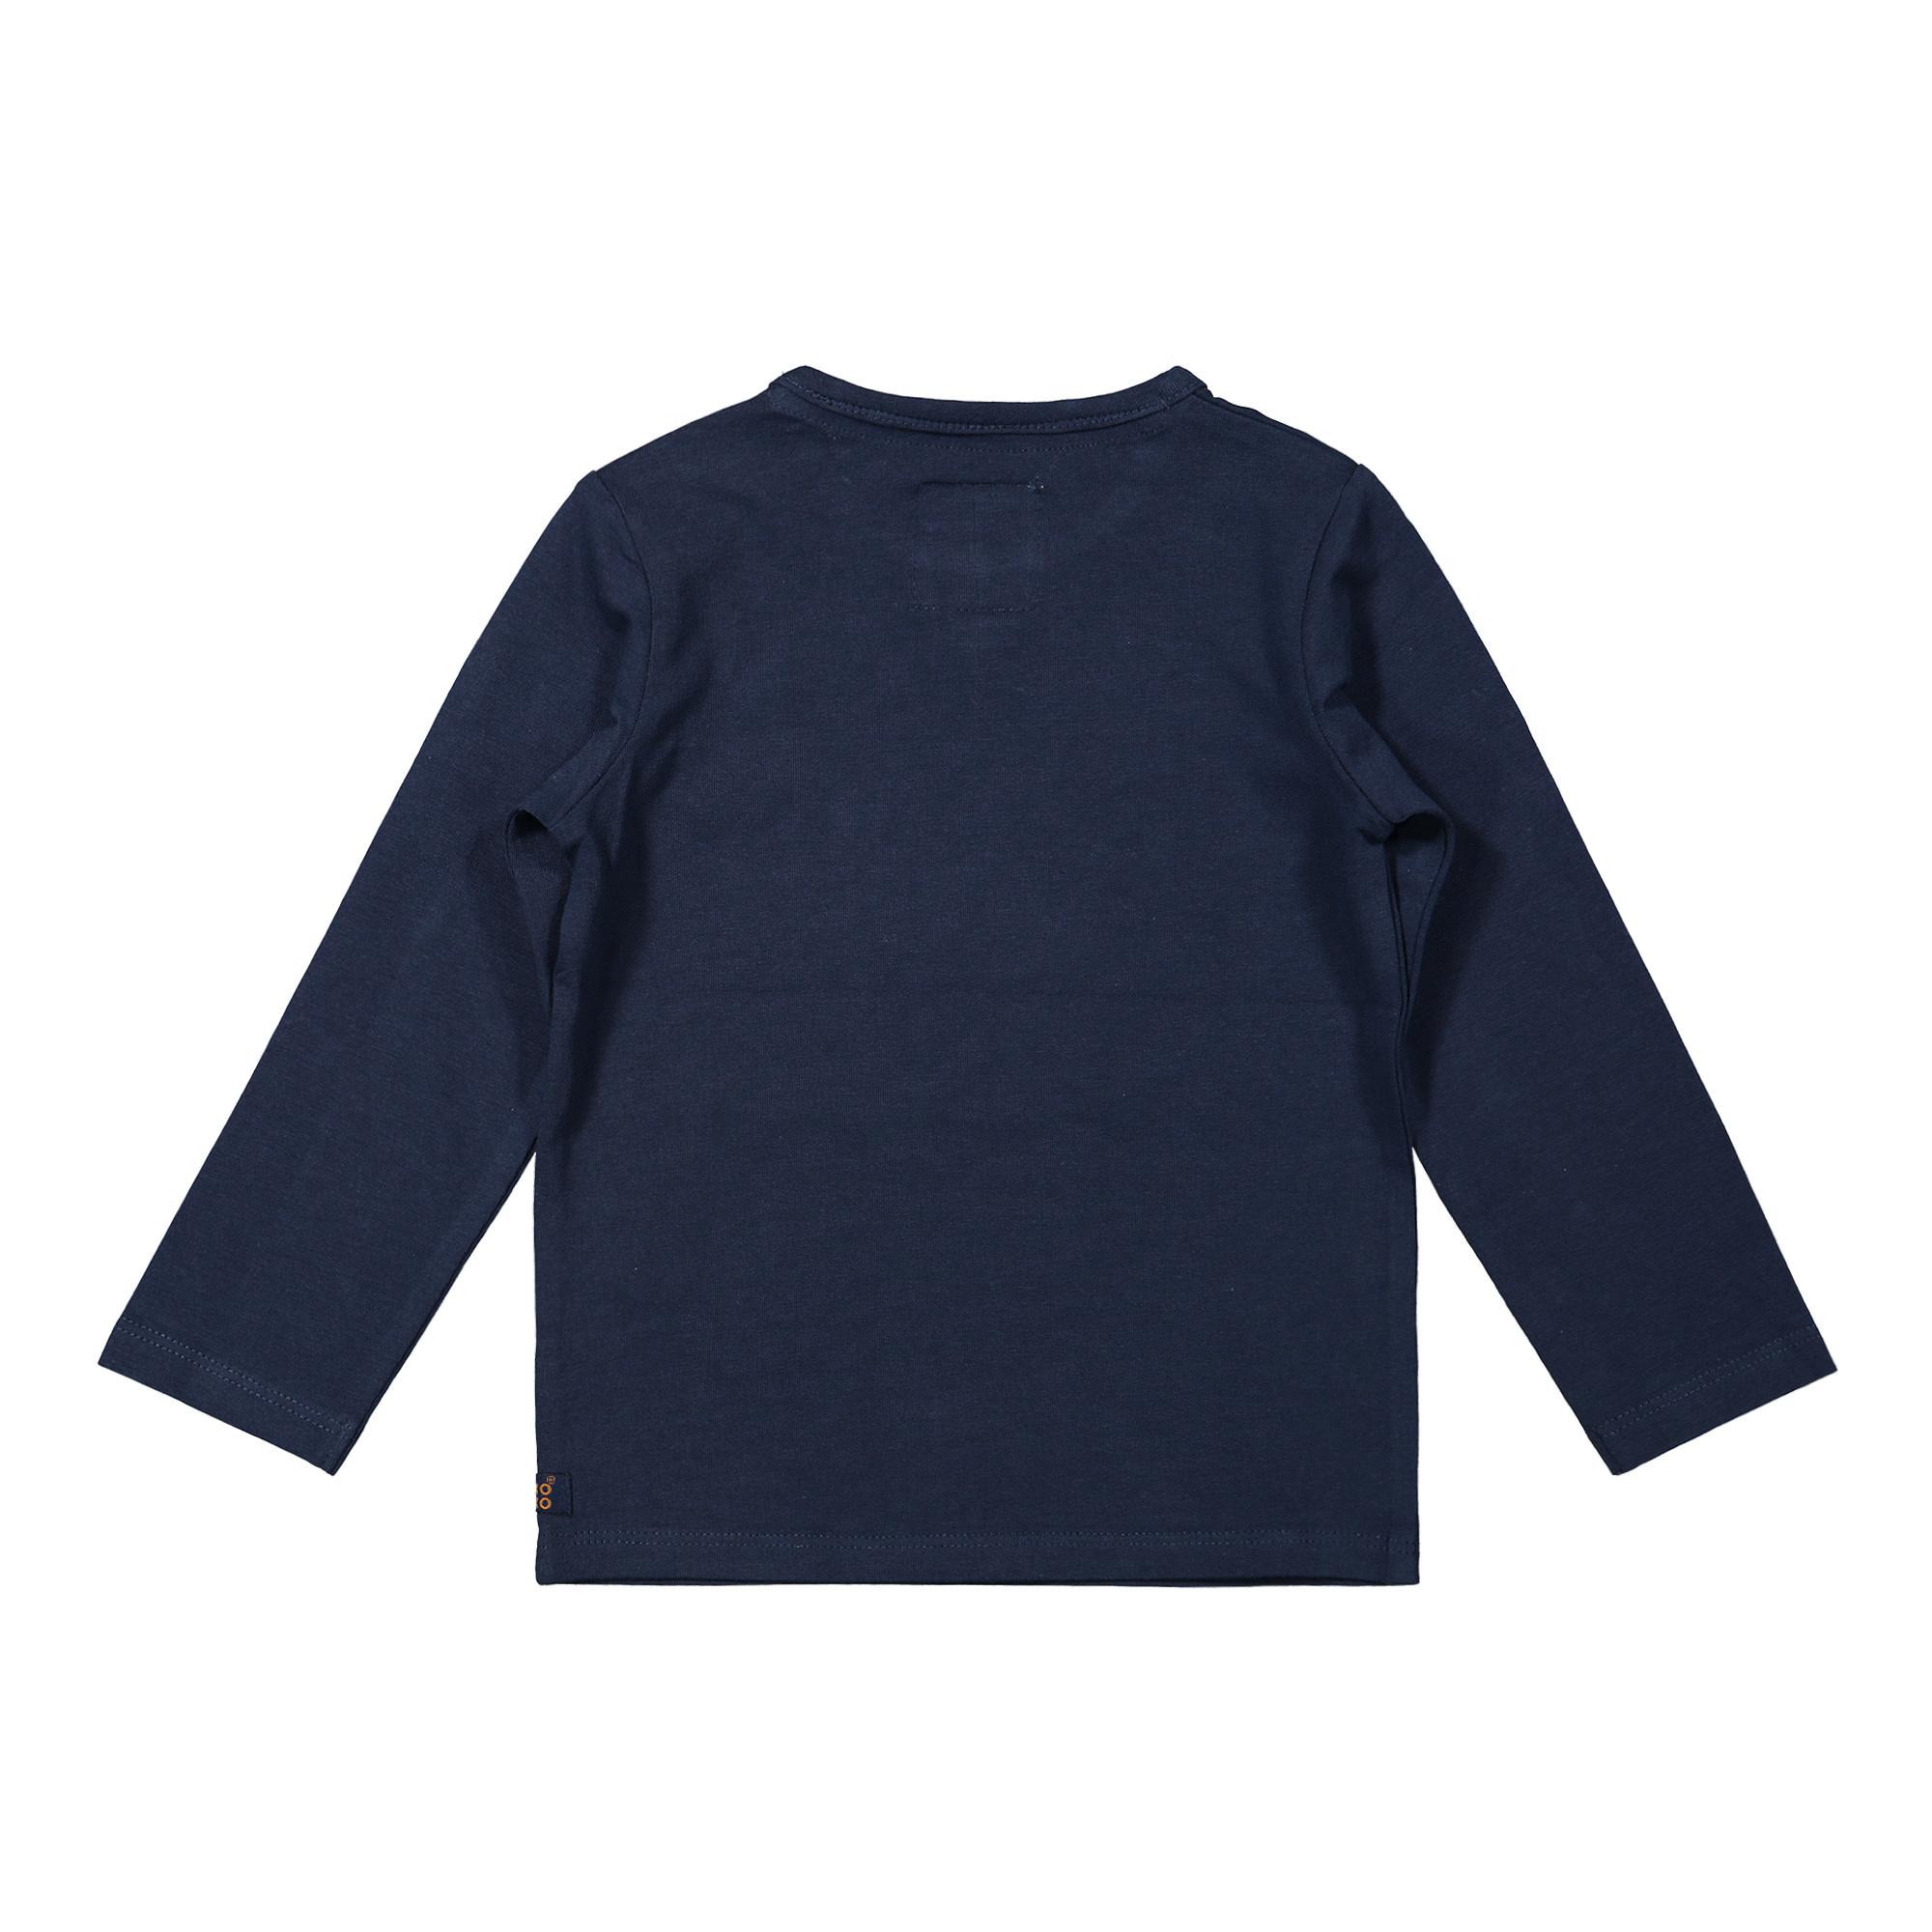 Tomahawk Long Sleeved Shirt